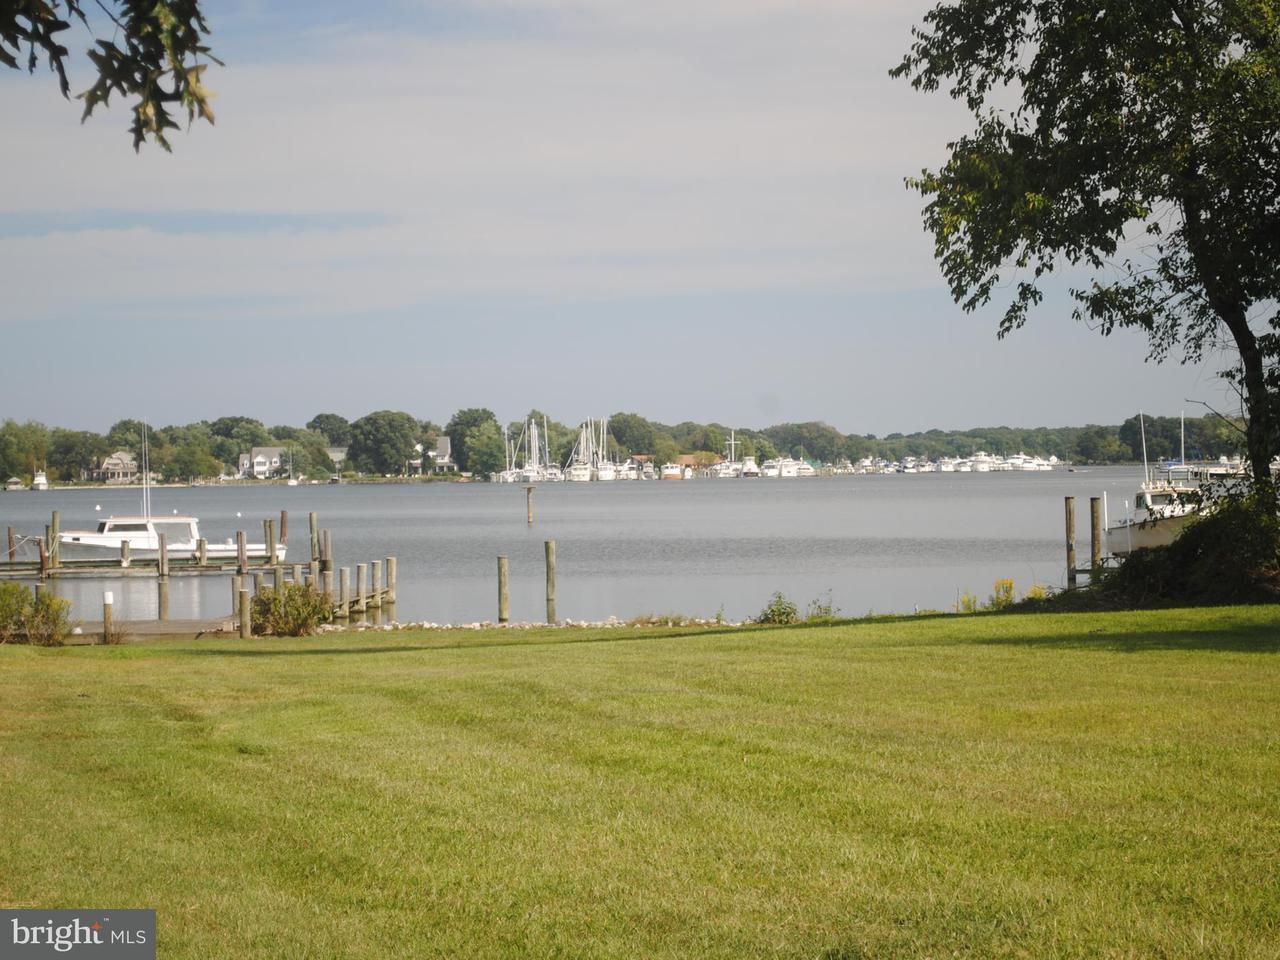 Land for Sale at 4847 CHURCH LANE 4847 CHURCH LANE Galesville, Maryland 20765 United States